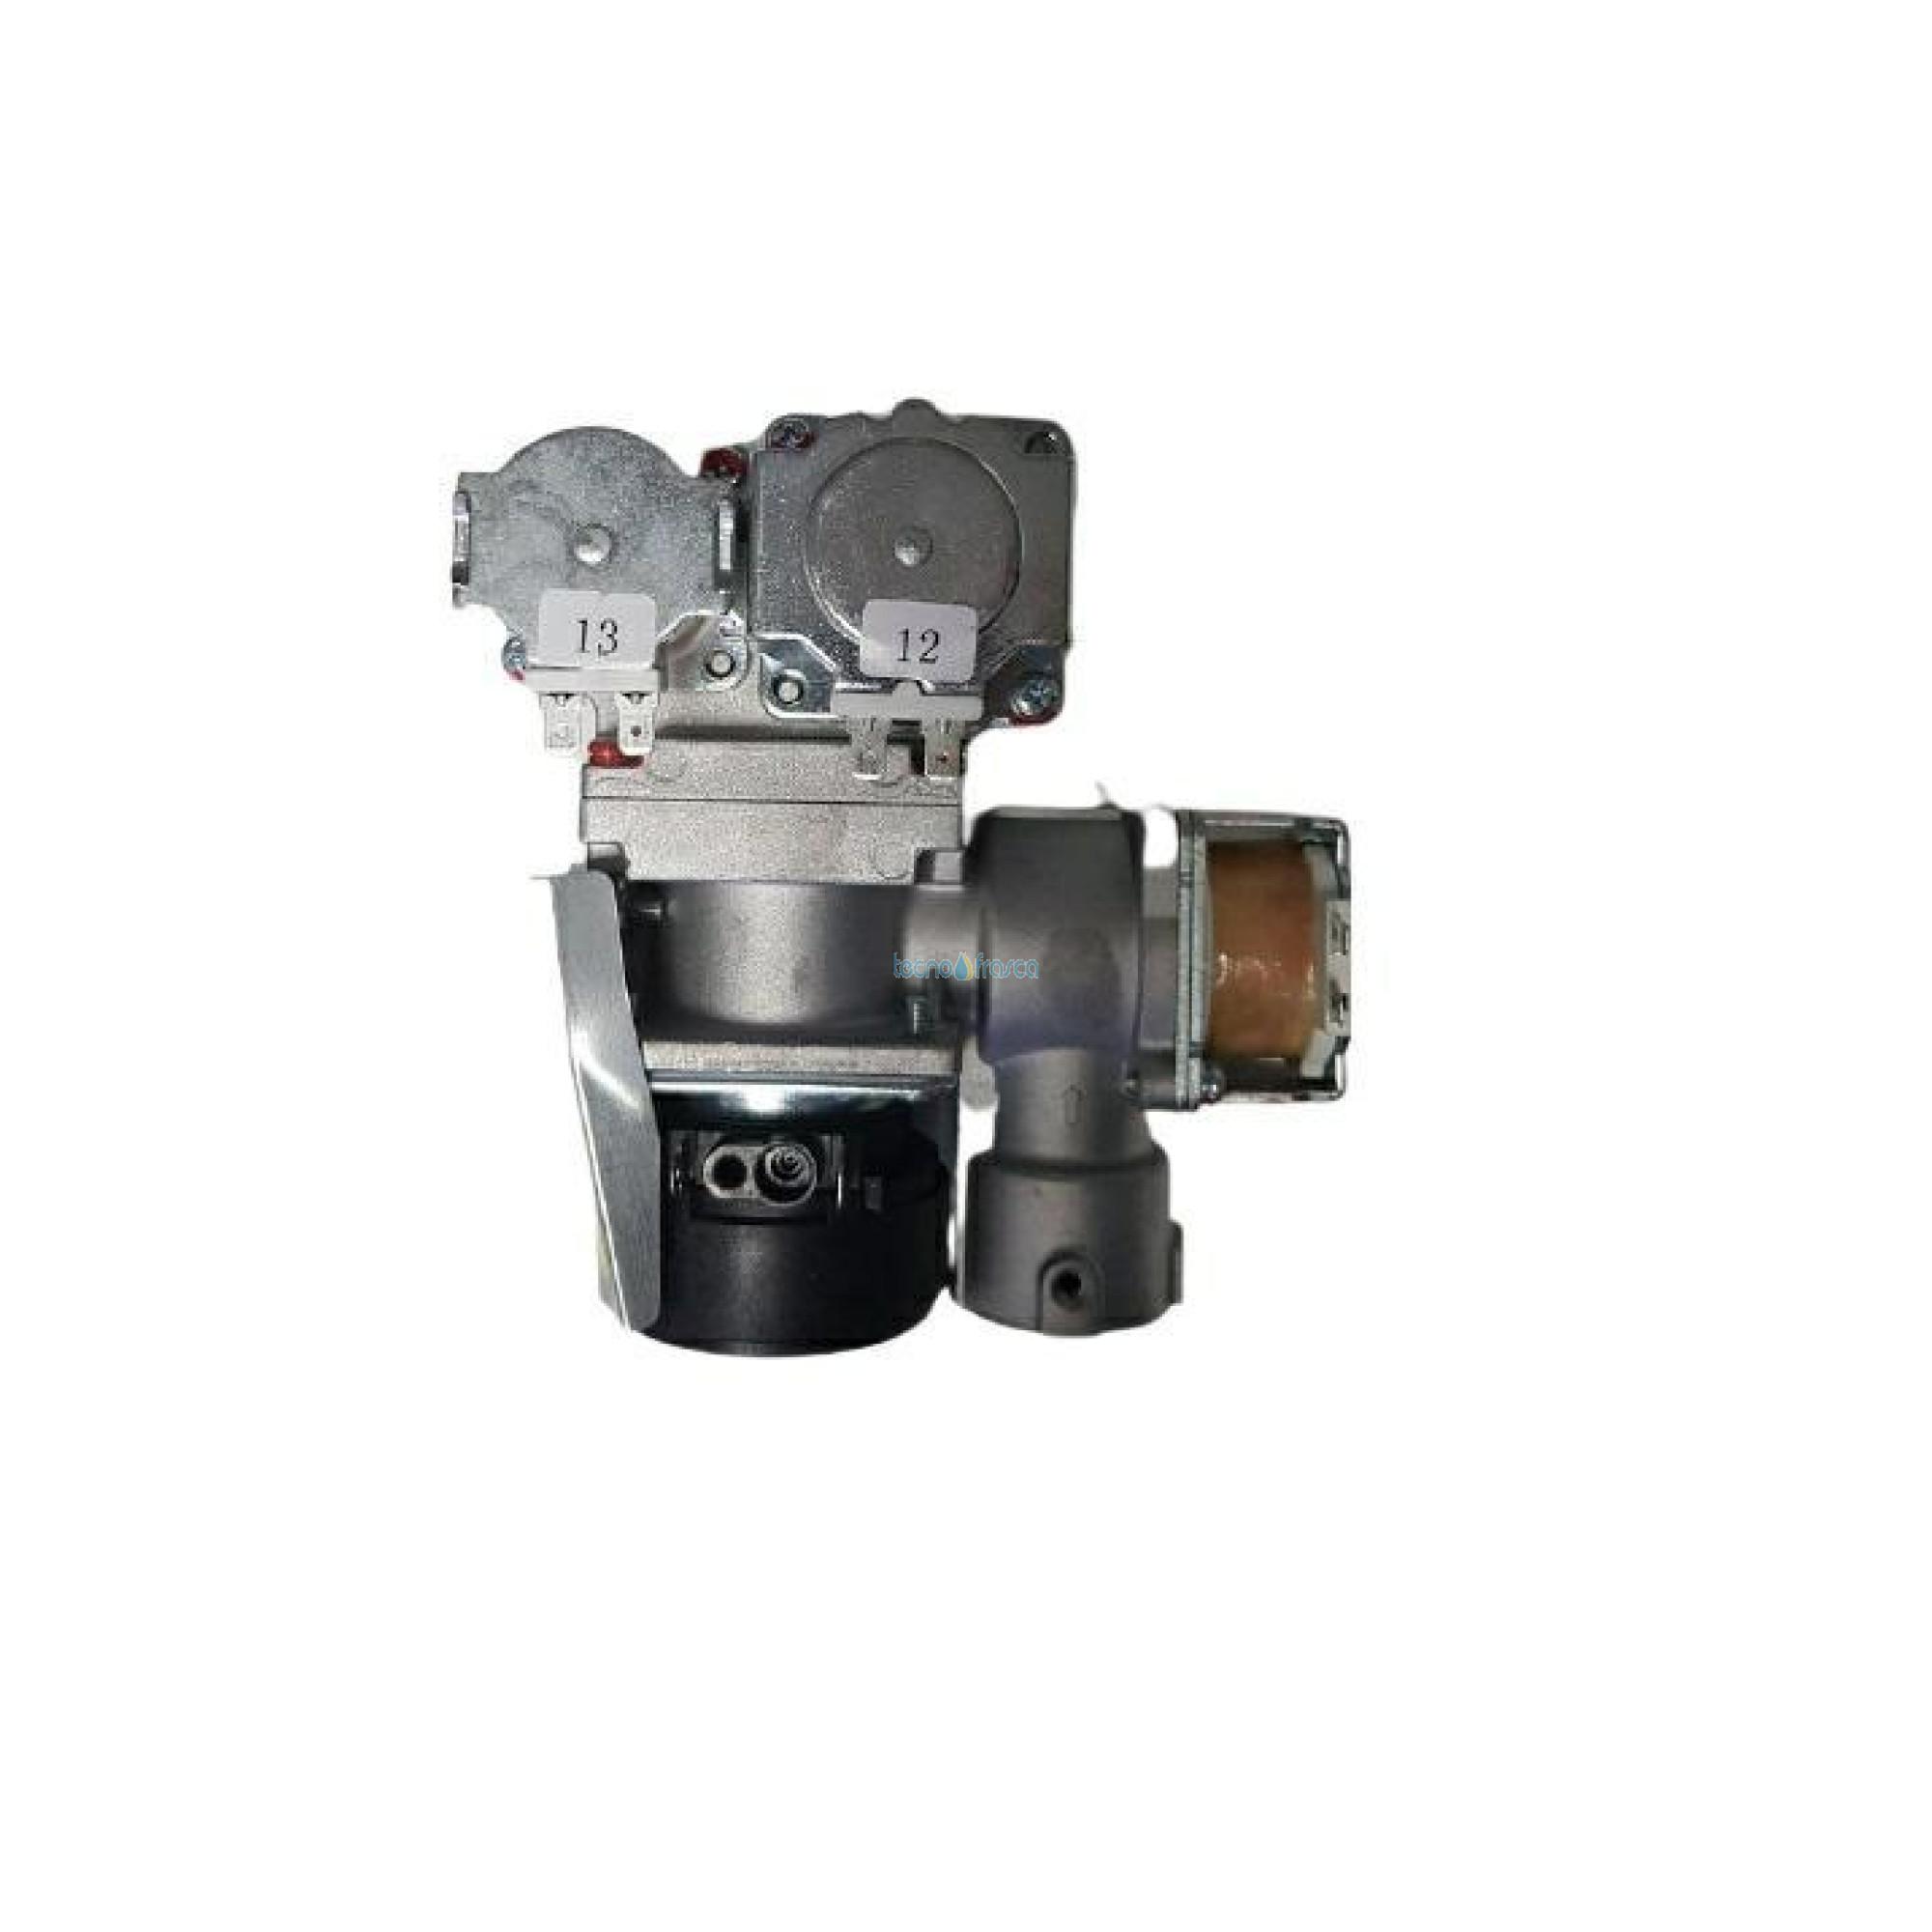 Ariston valvola gas gpl 65152753